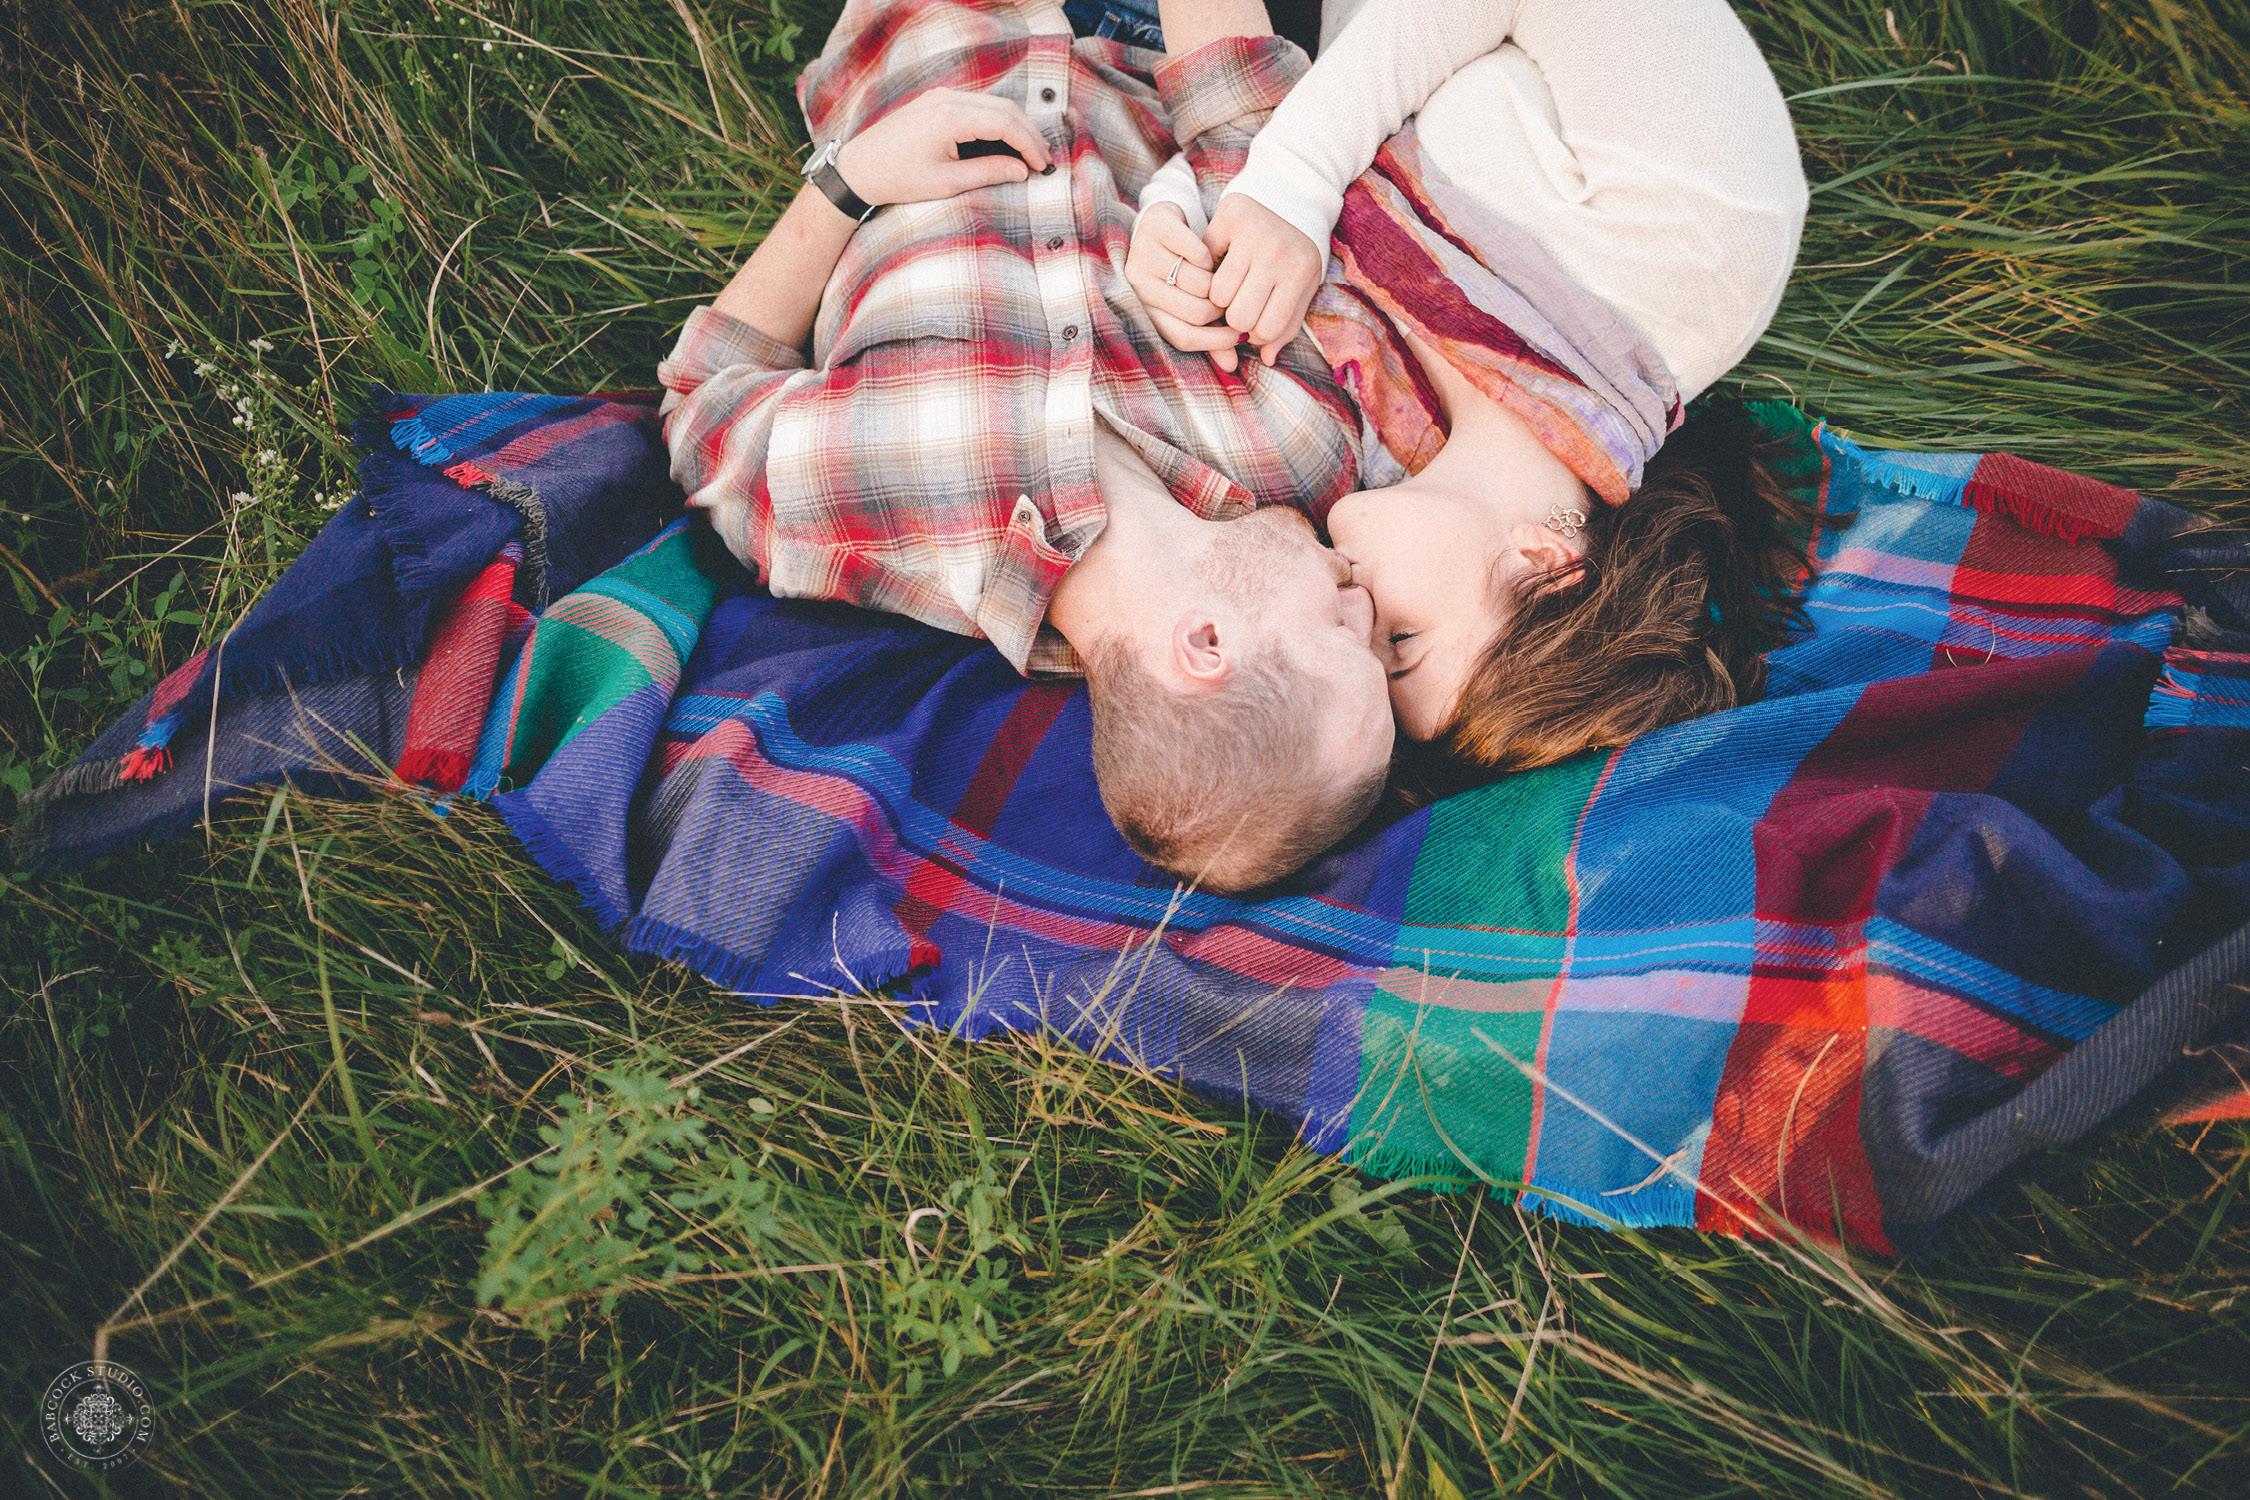 kristen-tom-engagement-photographer-dayton-ohio-fb-6.jpg